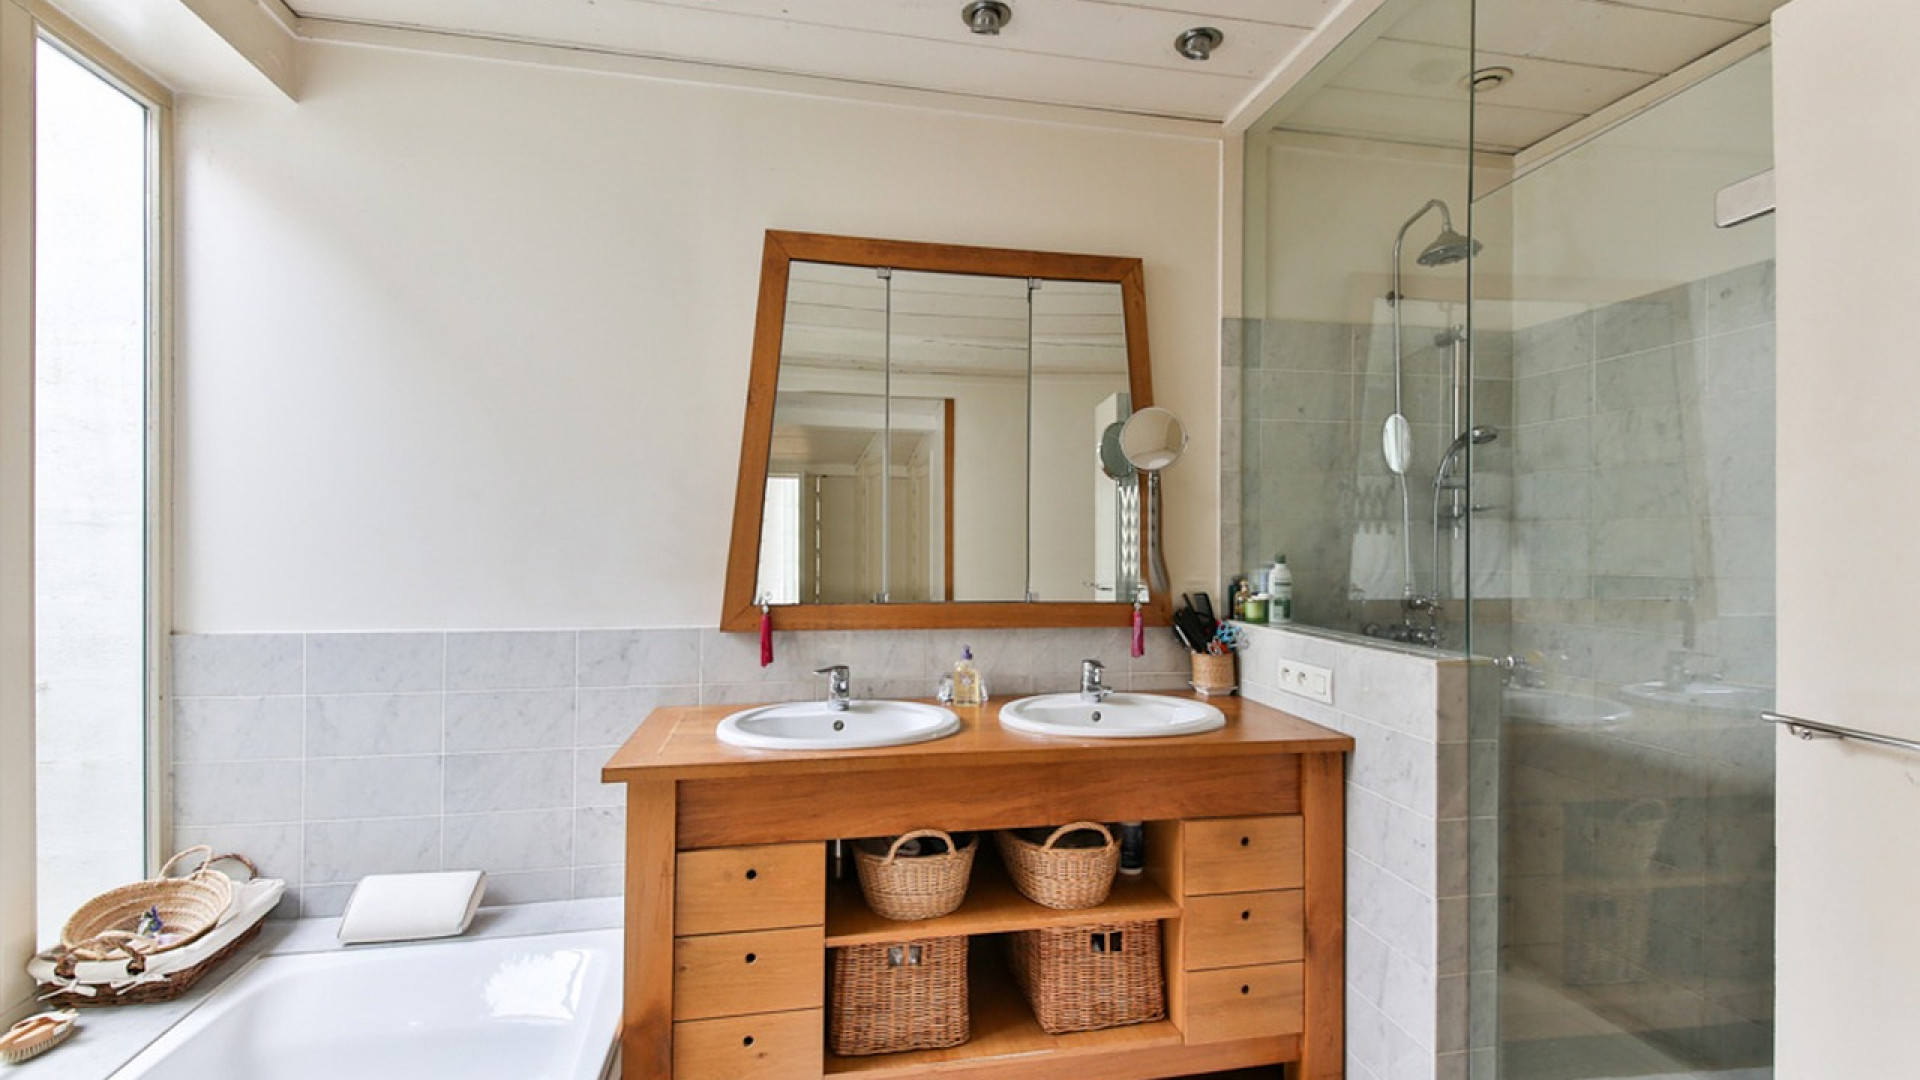 Pourquoi installer une salle de bain en teck?